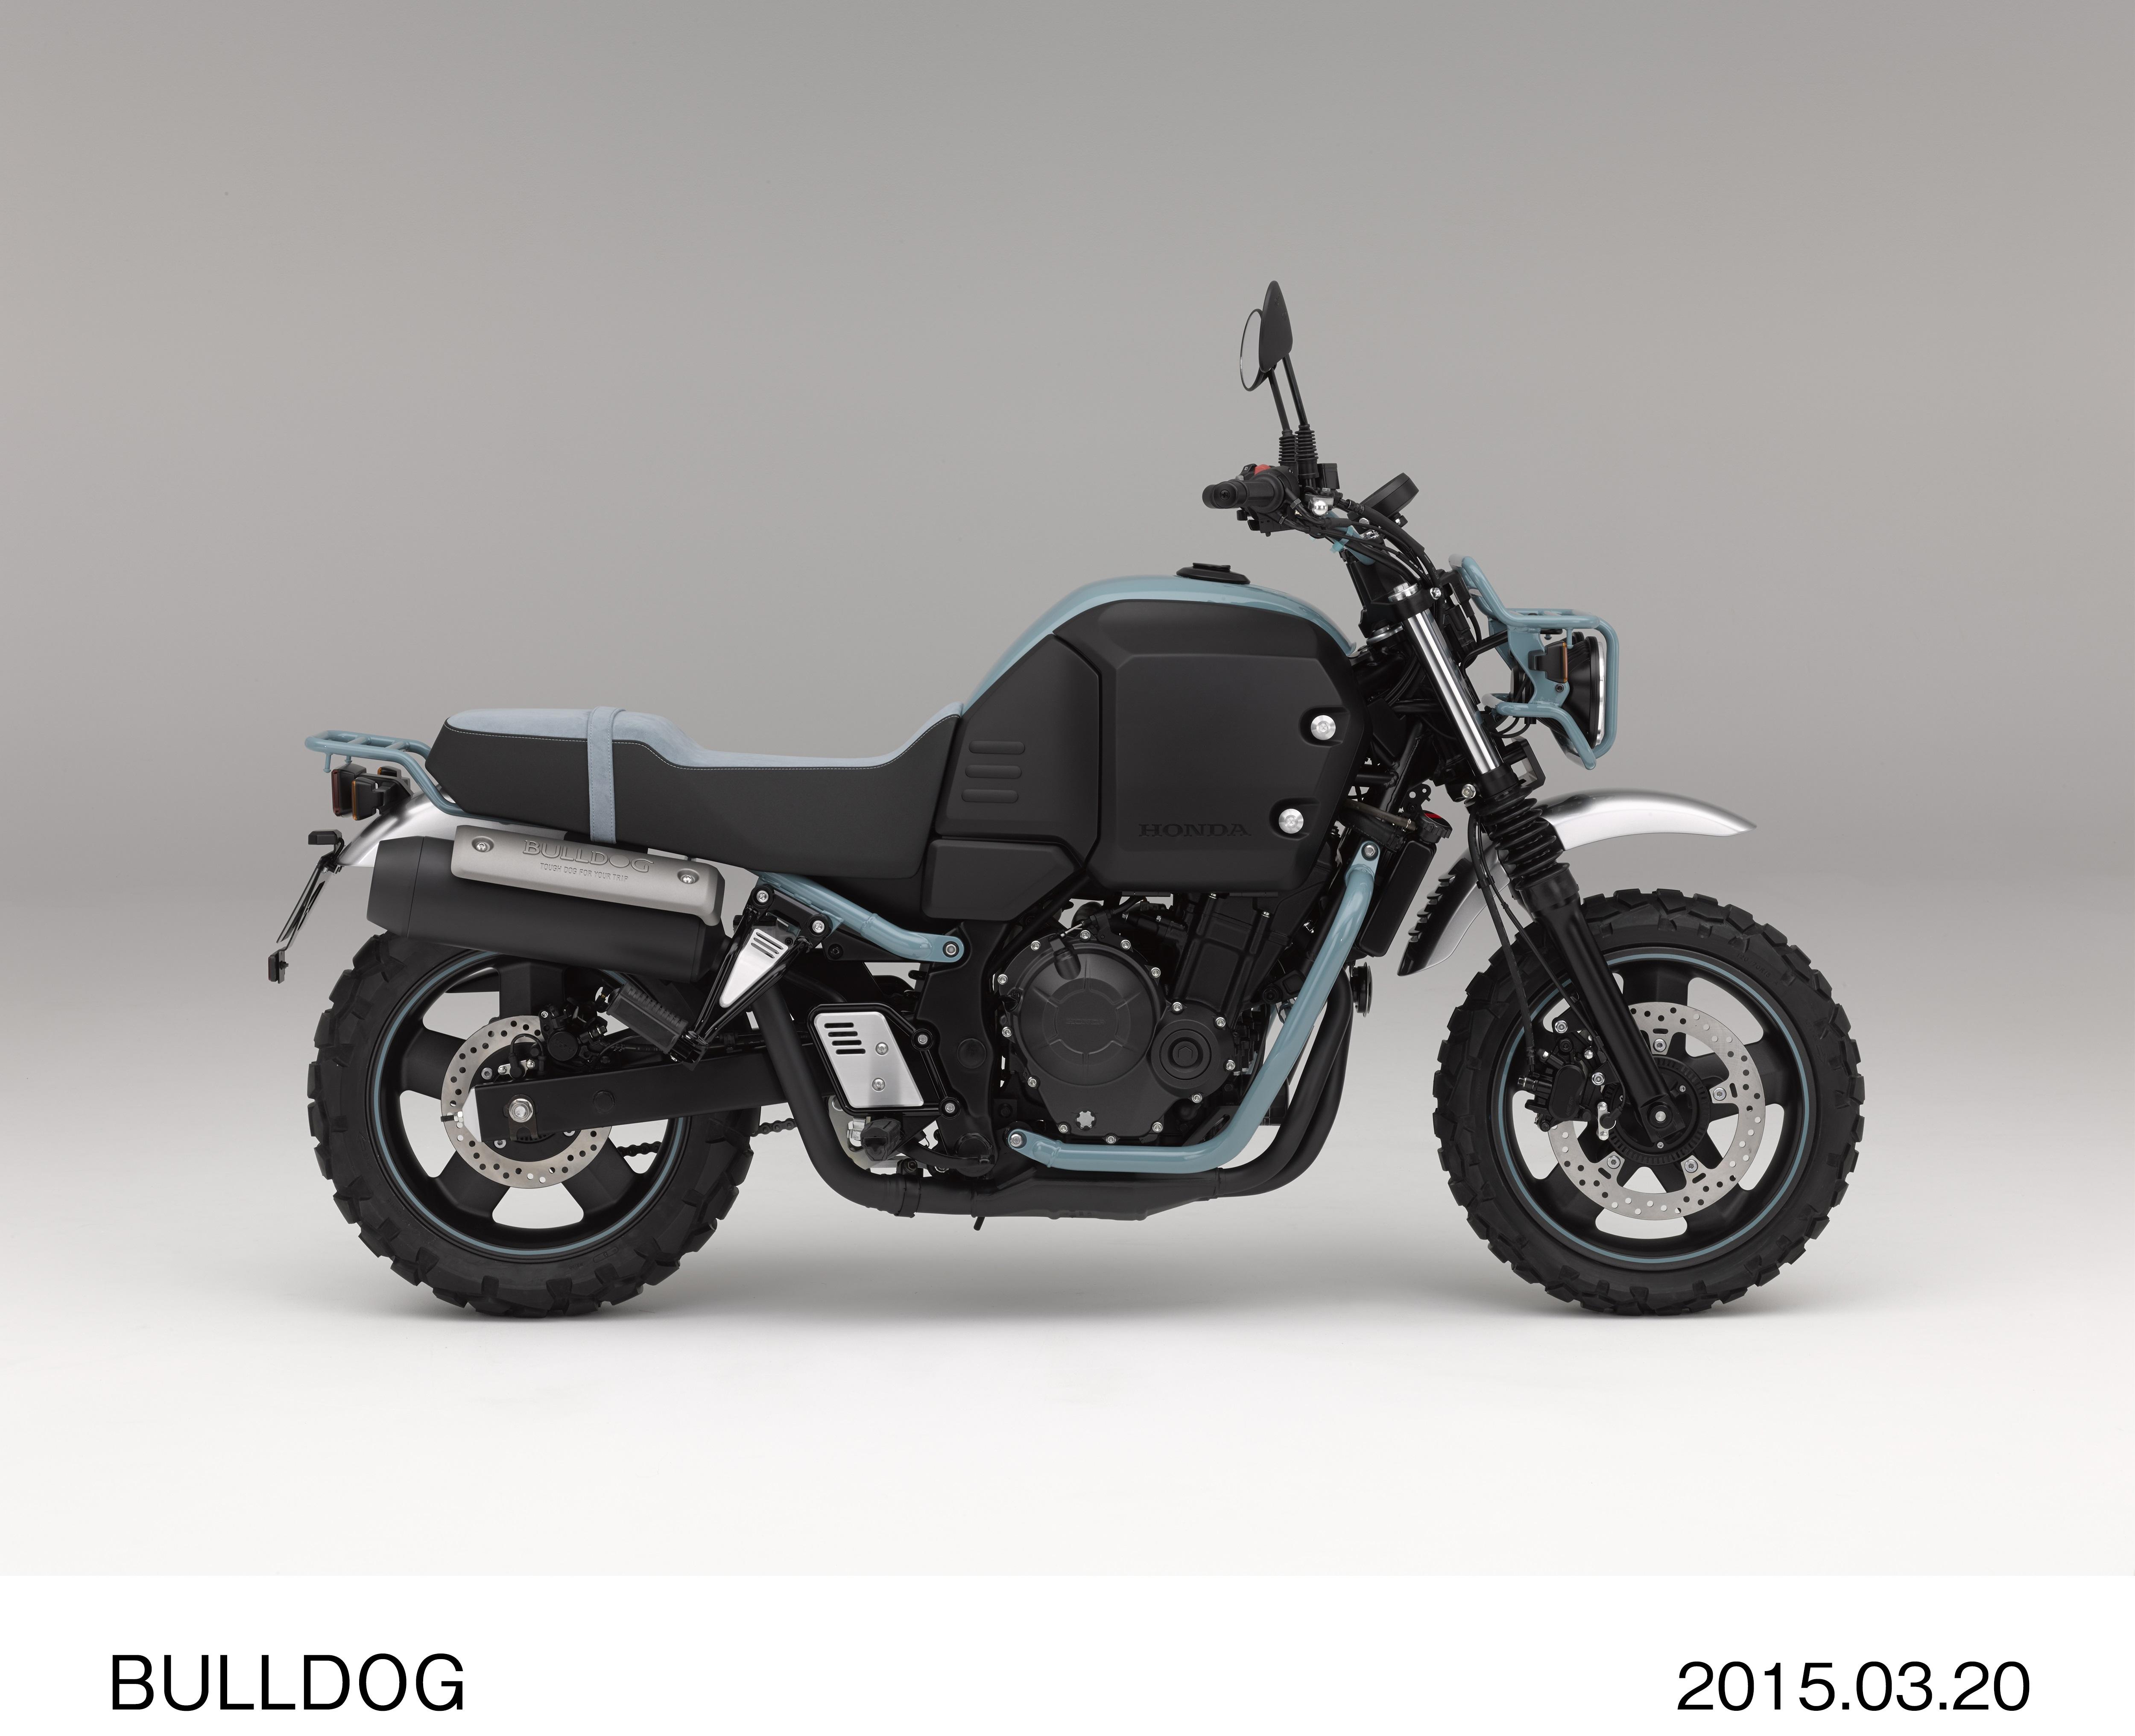 Honda's Bulldog concept headed for production